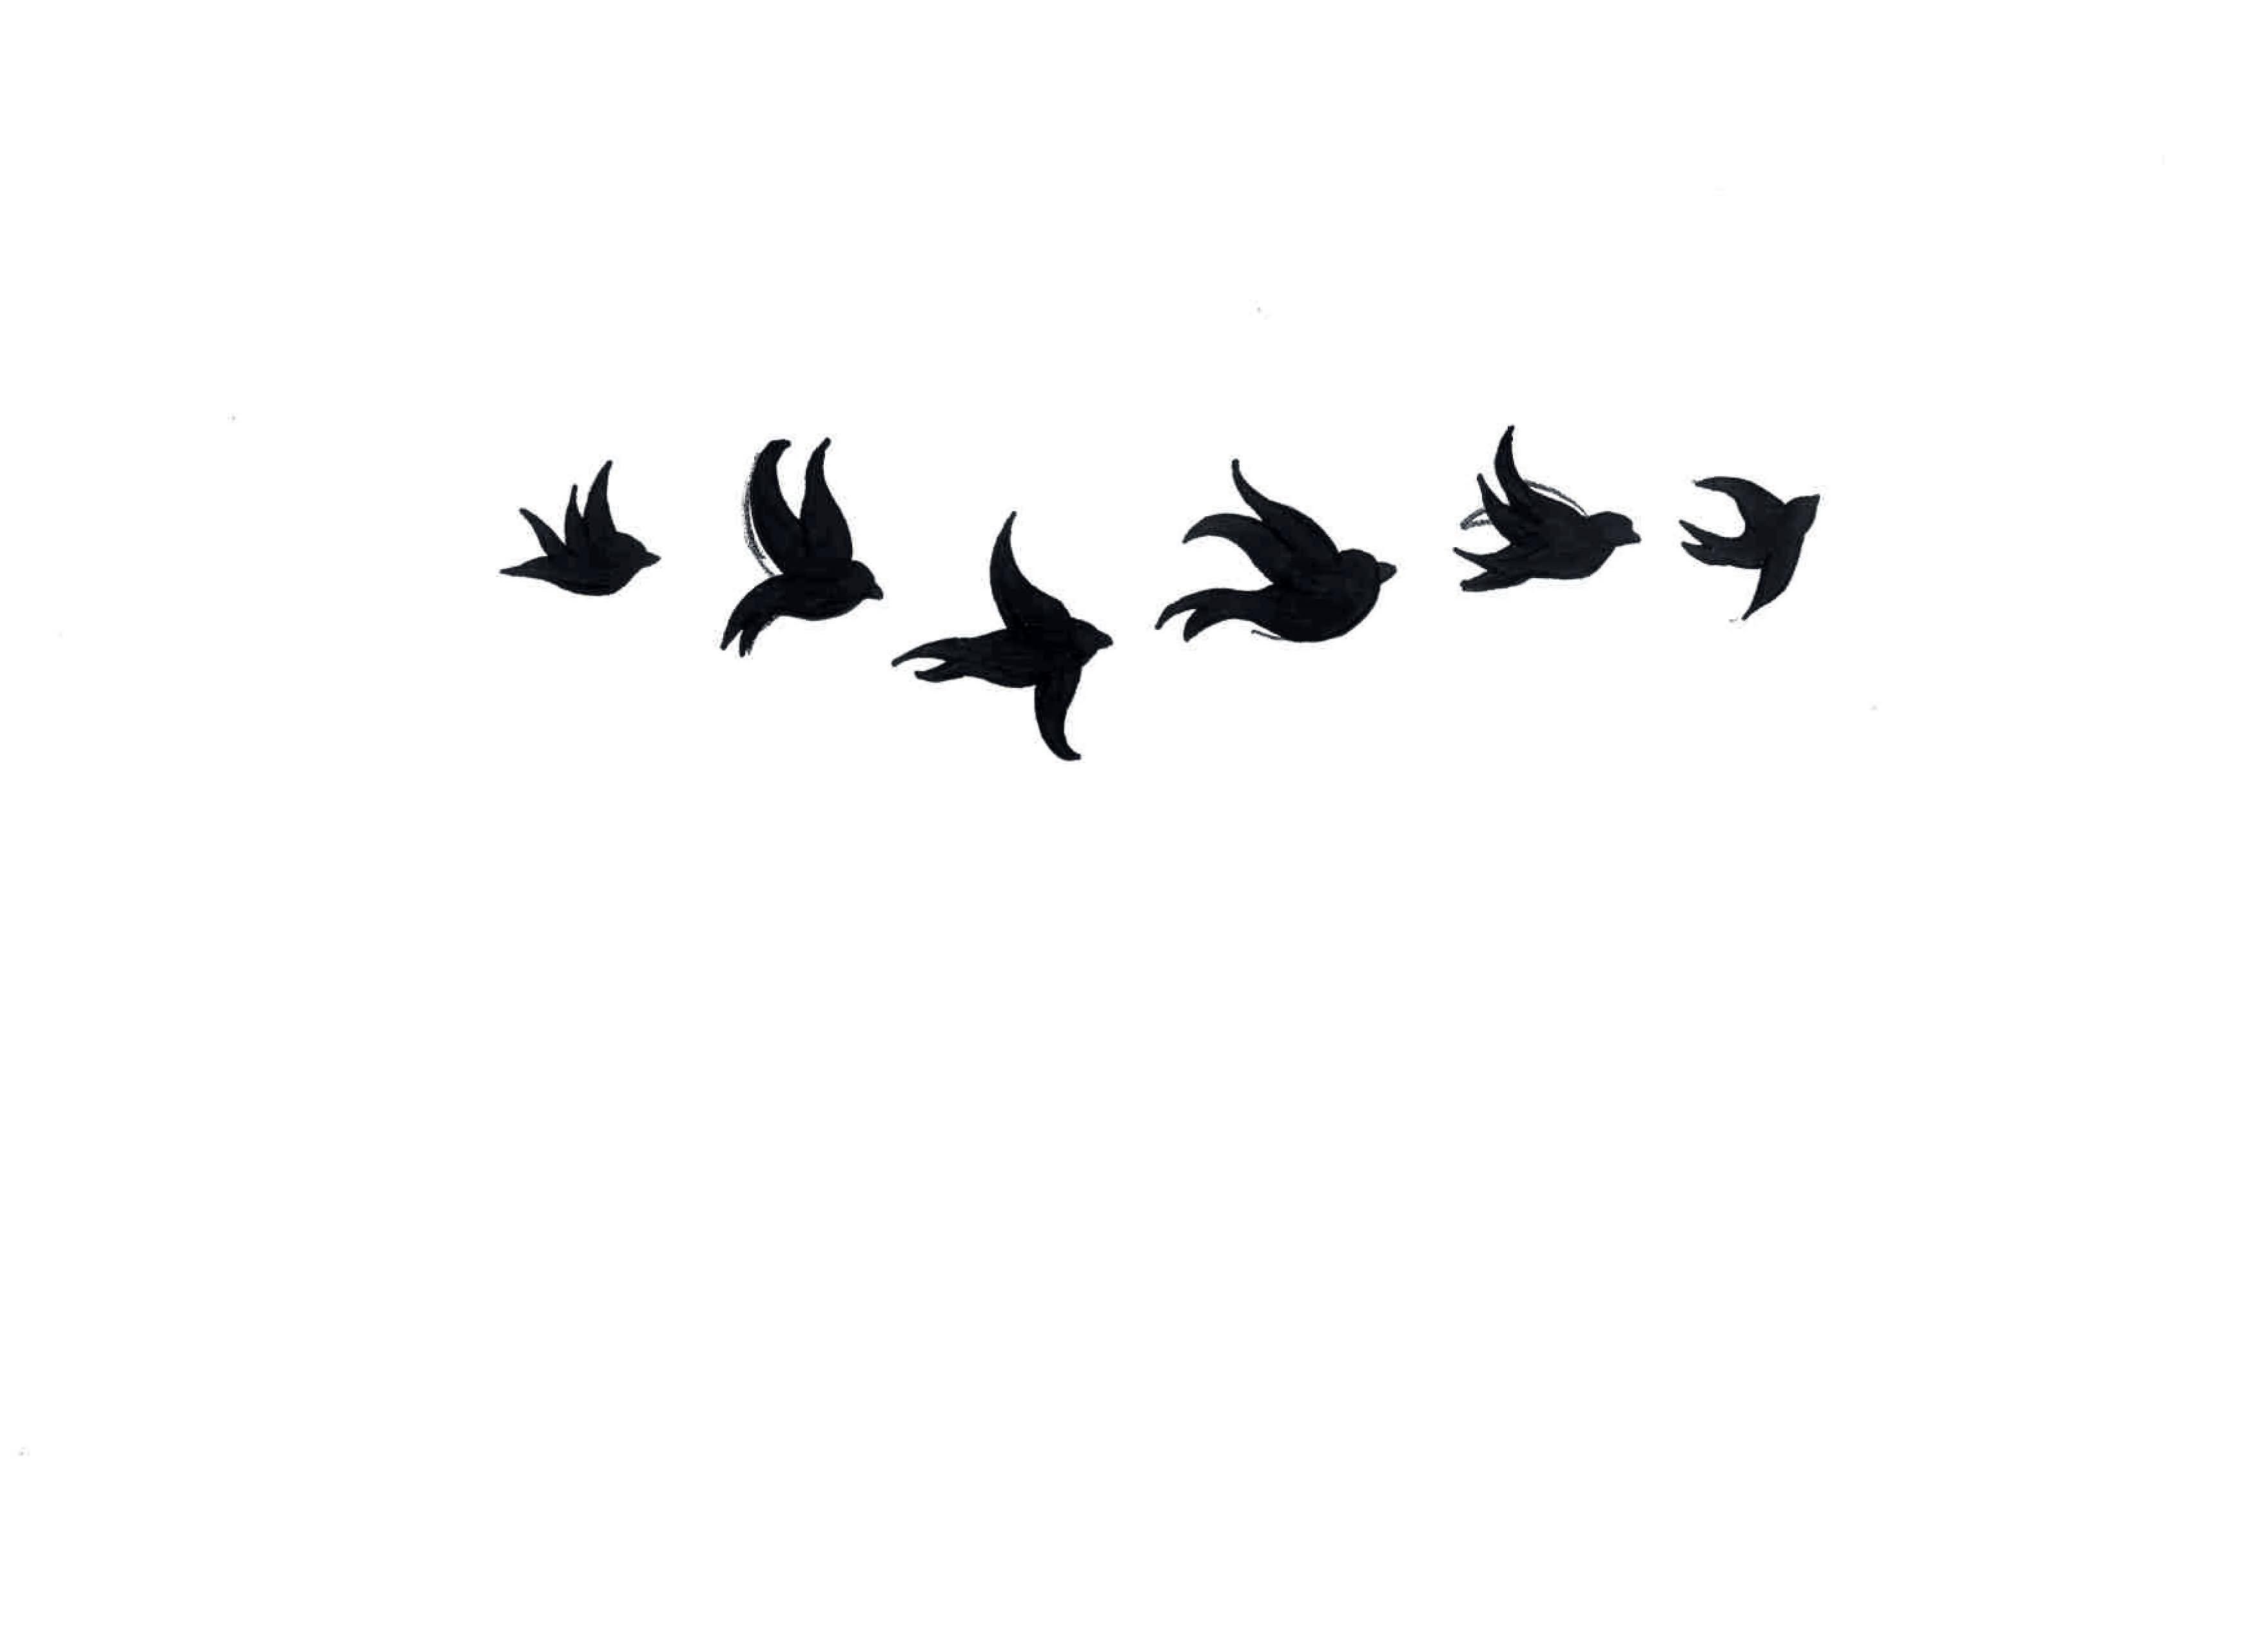 642dc0a94 Amazing Black Six Flying Birds Tattoo Stencil | Bird tattoos | Bird ...